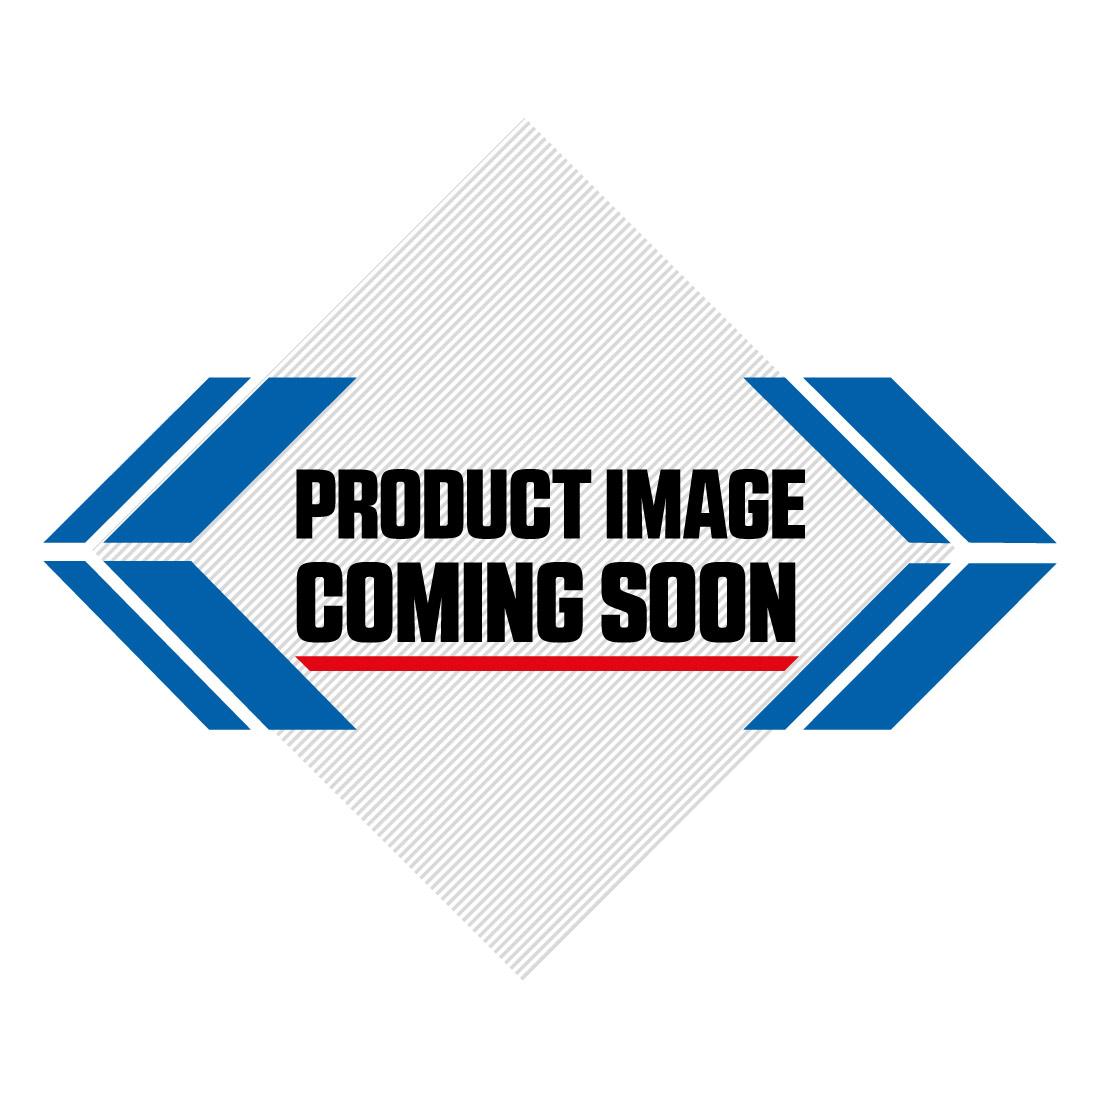 Suzuki Plastic Kit RMZ 450 (08-17) OEM Factory Image-3>